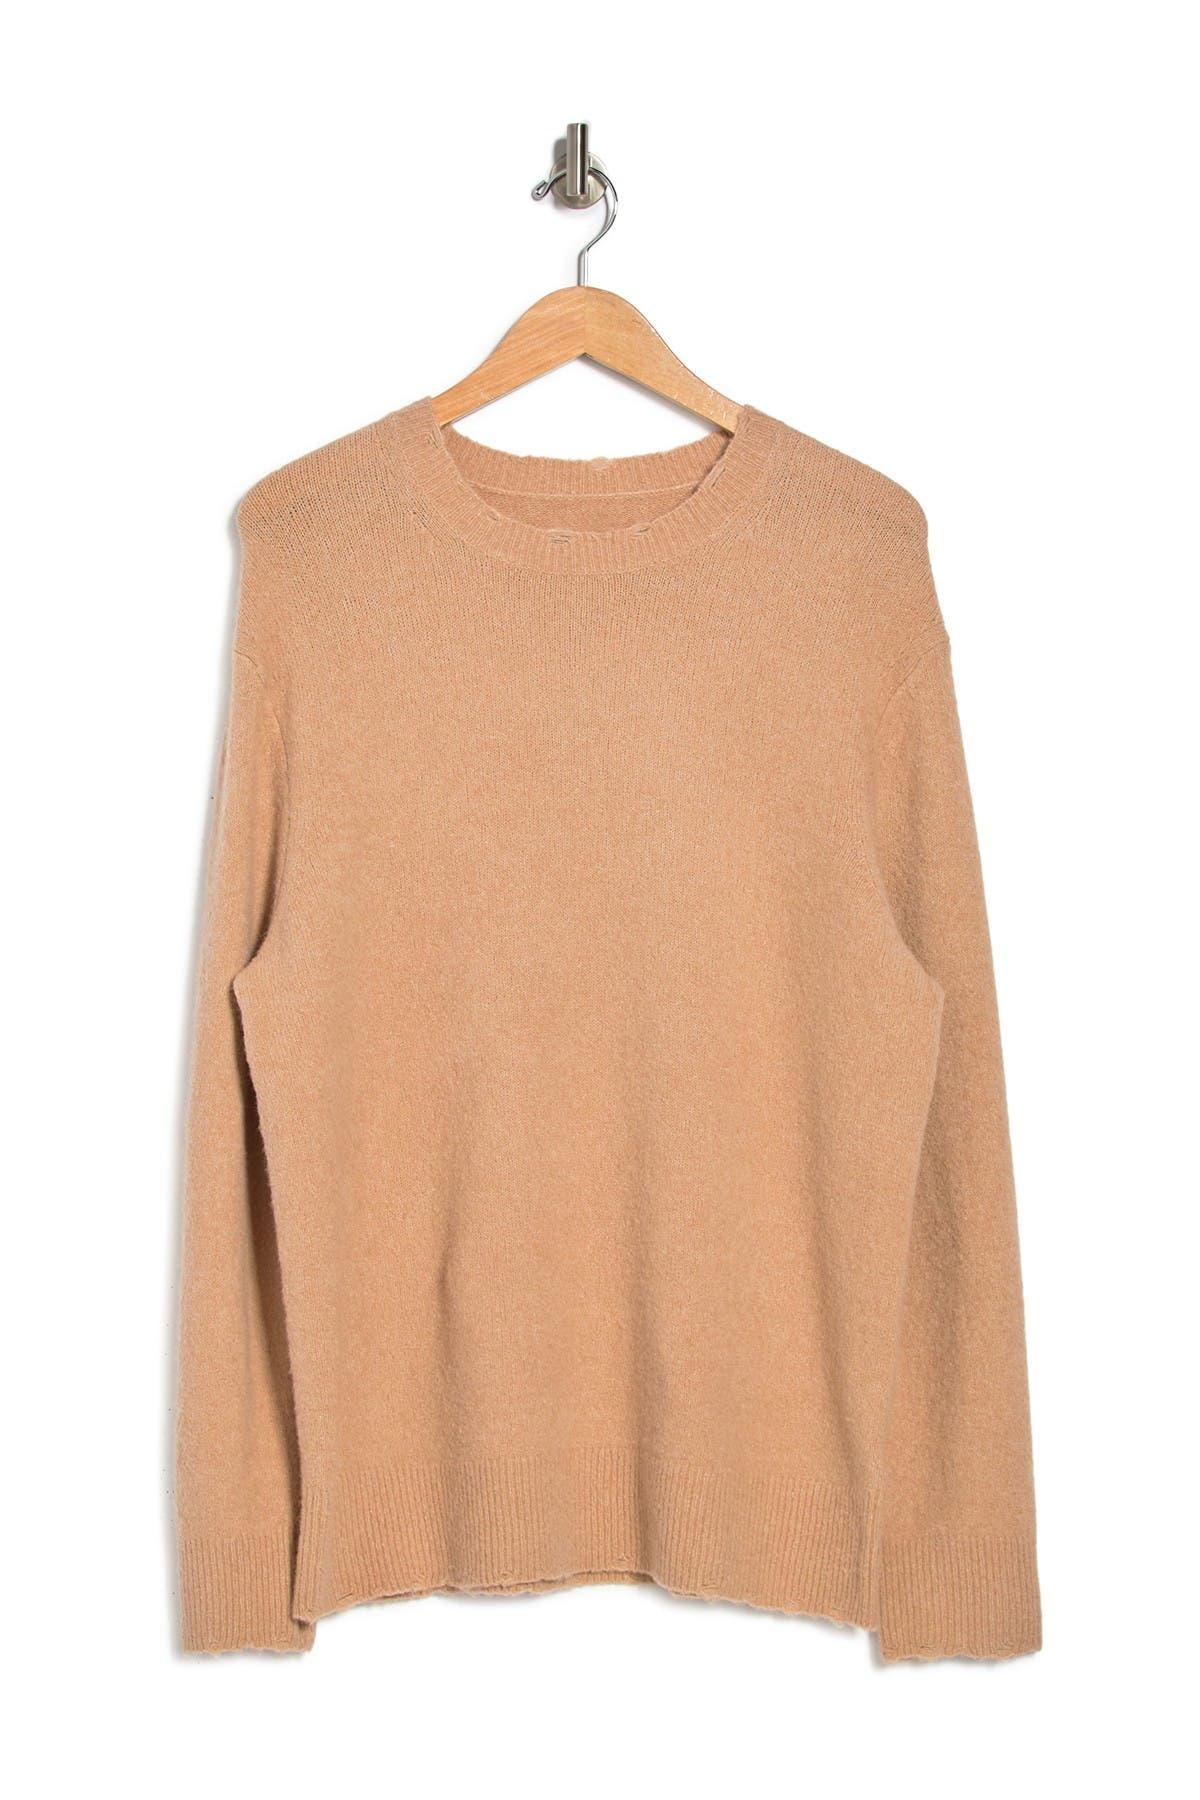 Allsaints Mode Slim Fit Merino Wool Sweater In Golden Brown Marl